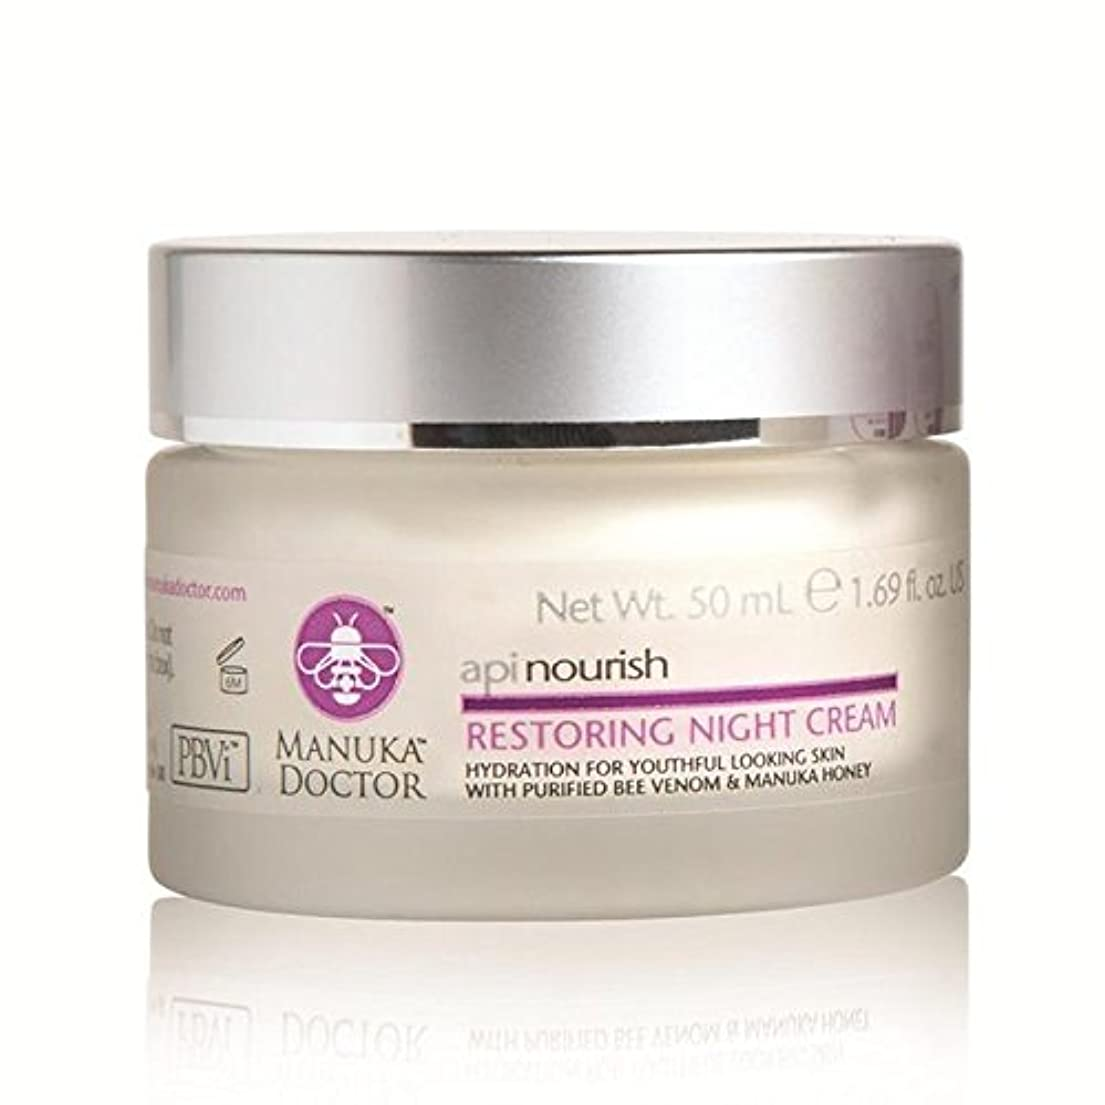 Manuka Doctor Api Nourish Restoring Night Cream 50ml (Pack of 6) - マヌカドクターは、夜のクリーム50ミリリットルを復元養います x6 [並行輸入品]